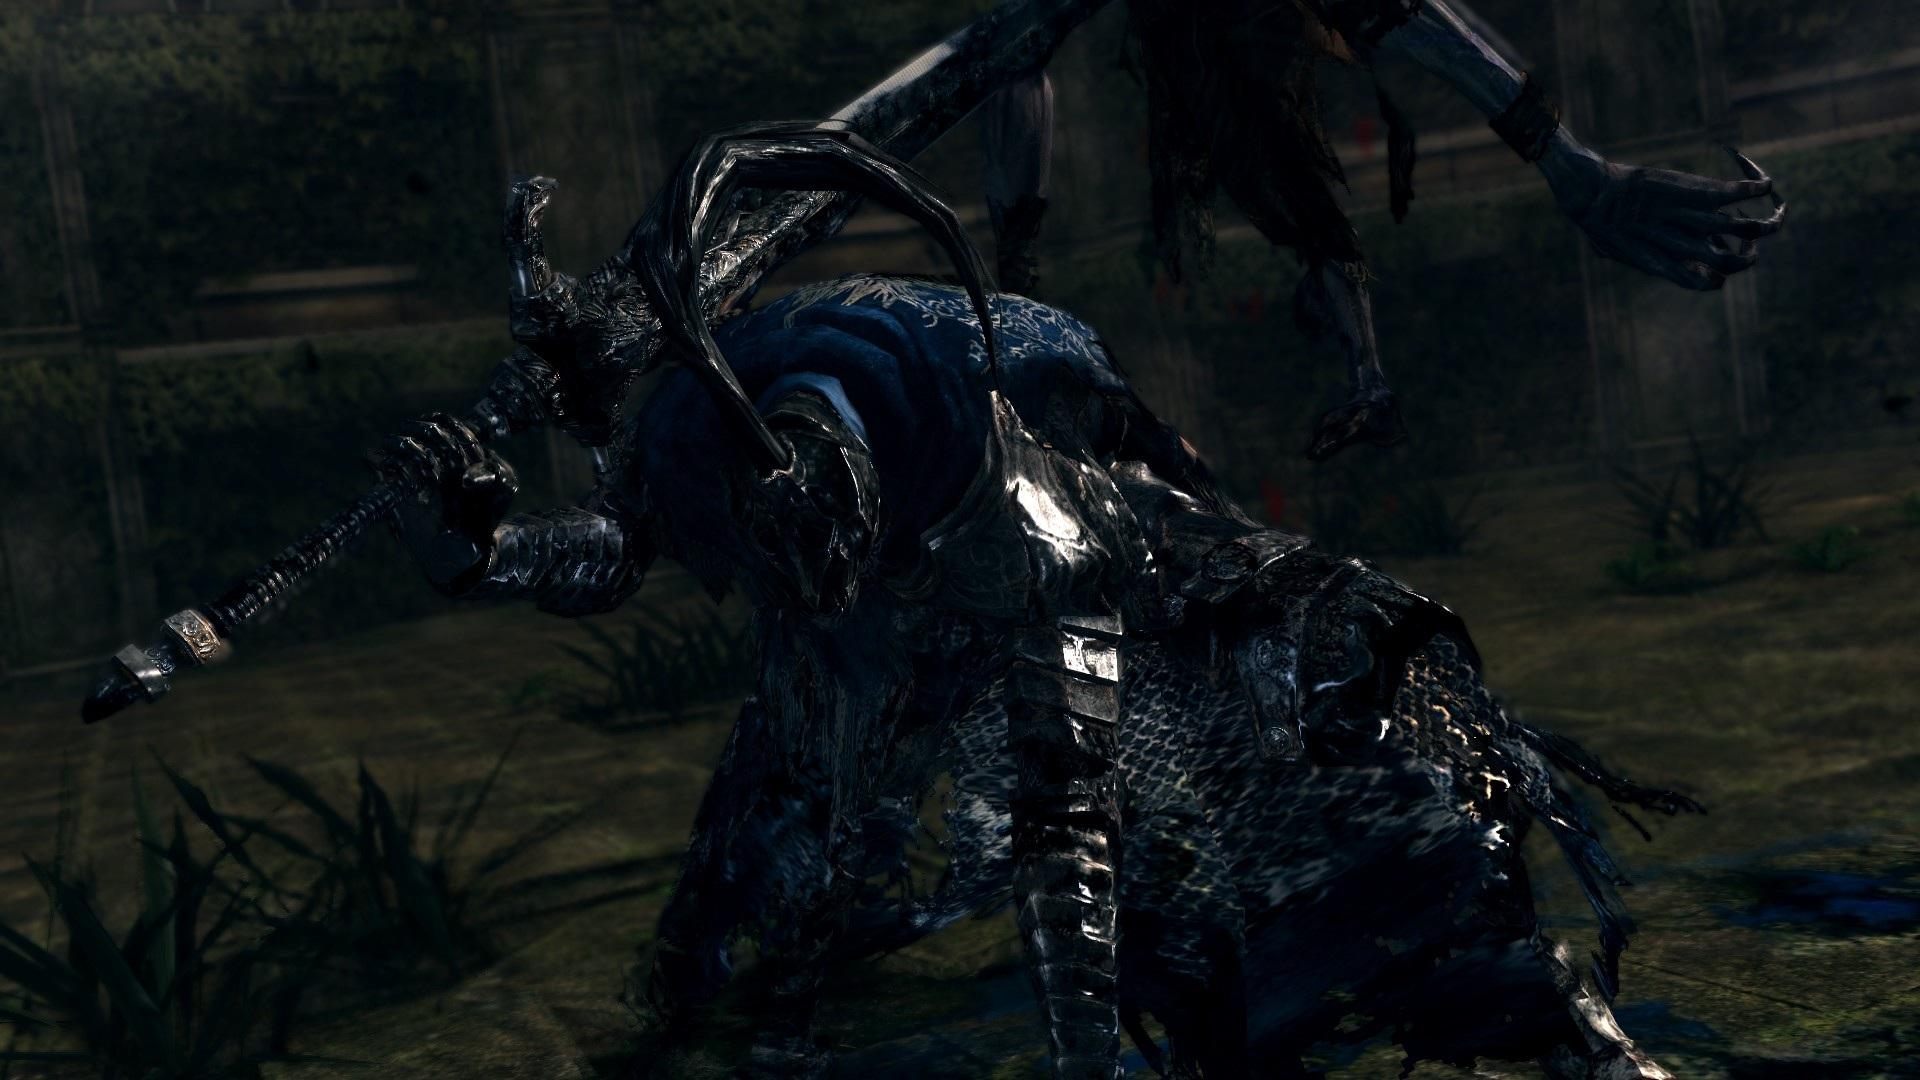 Artorias of the Abyss ۱۵ غول برتر سری Dark Souls